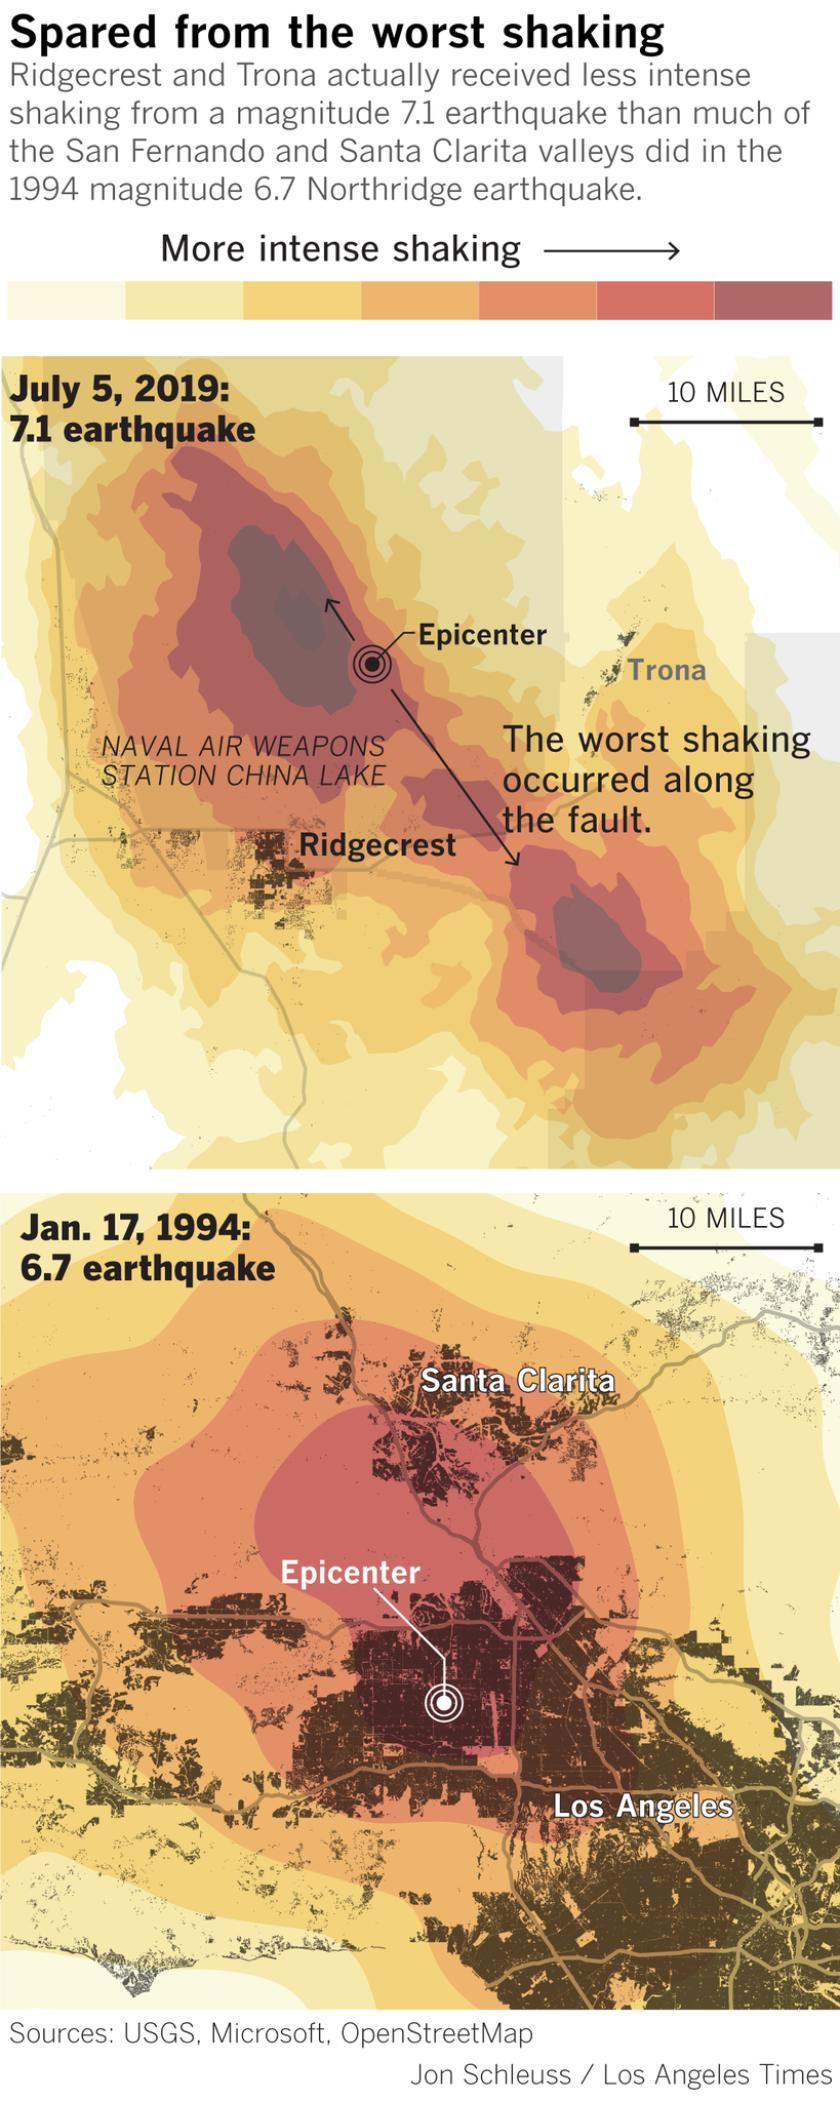 Ridgecrest earthquake shaking compared to Northridge